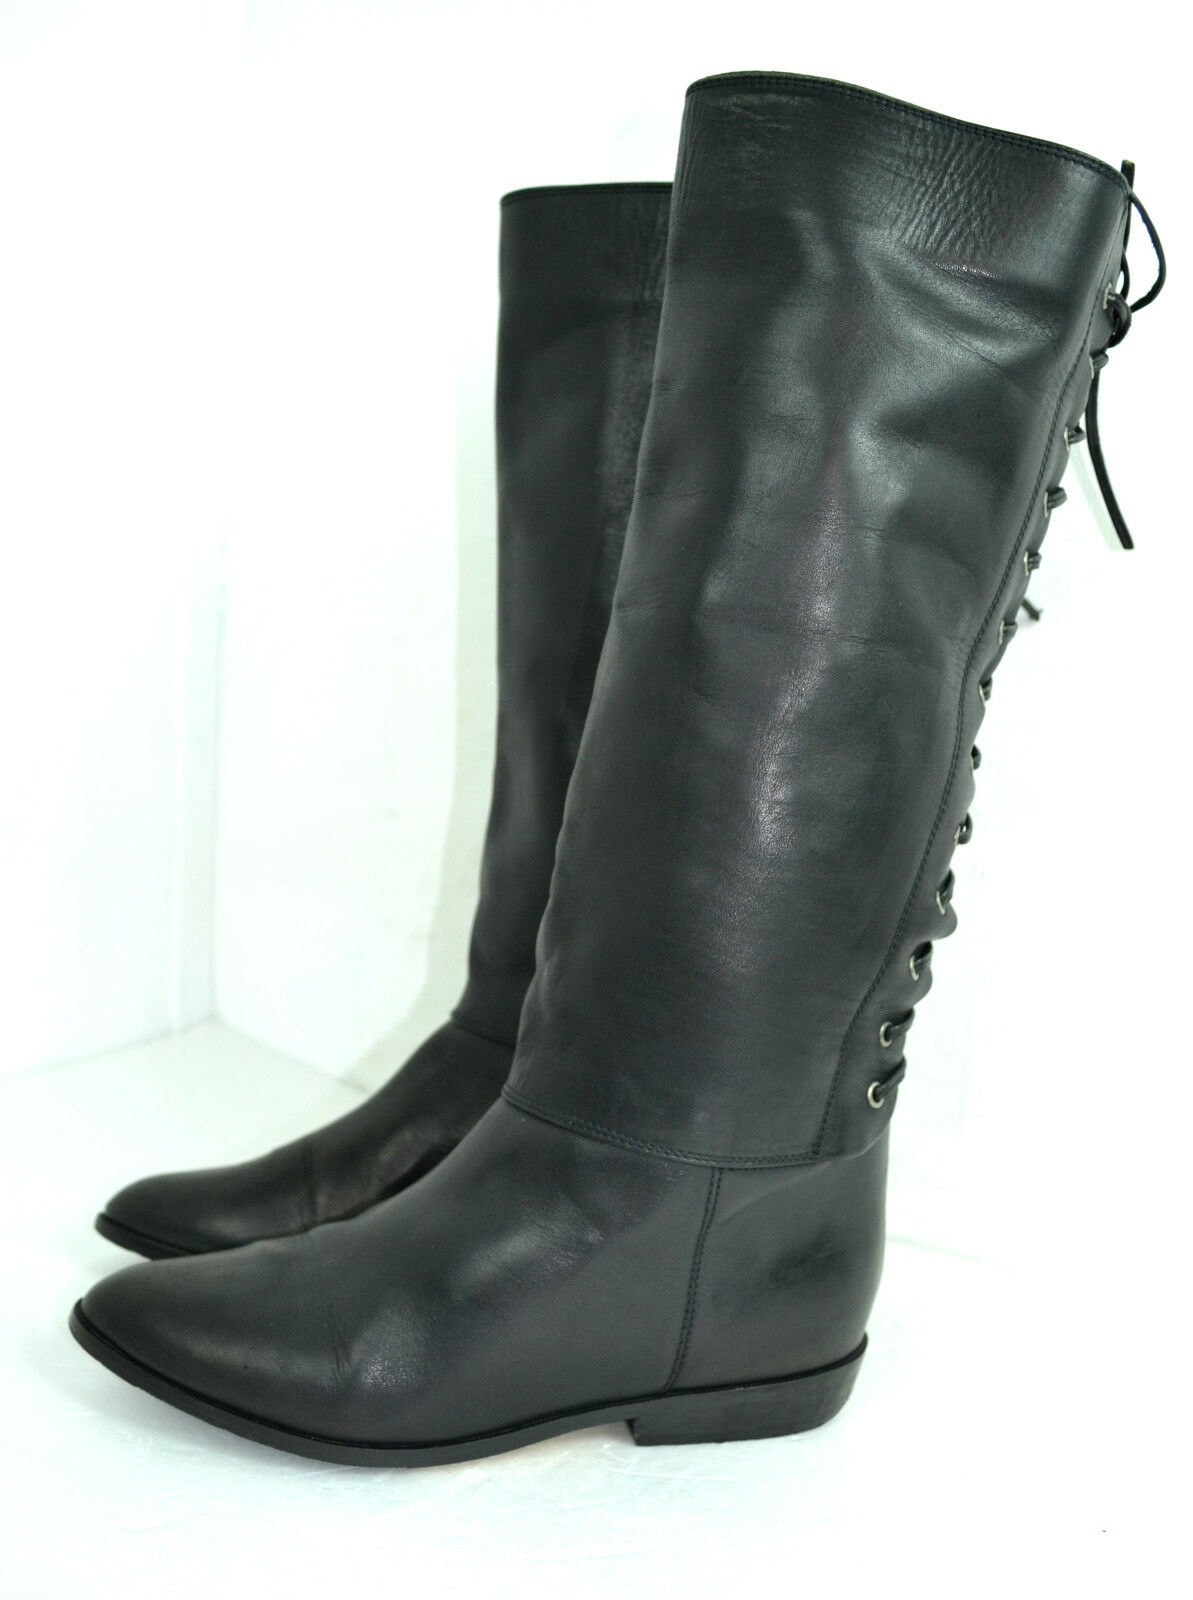 BIARRITZ BLACK GENUINE LEATHER WOMEN FLAT BOOTS SIZE 8 B 1